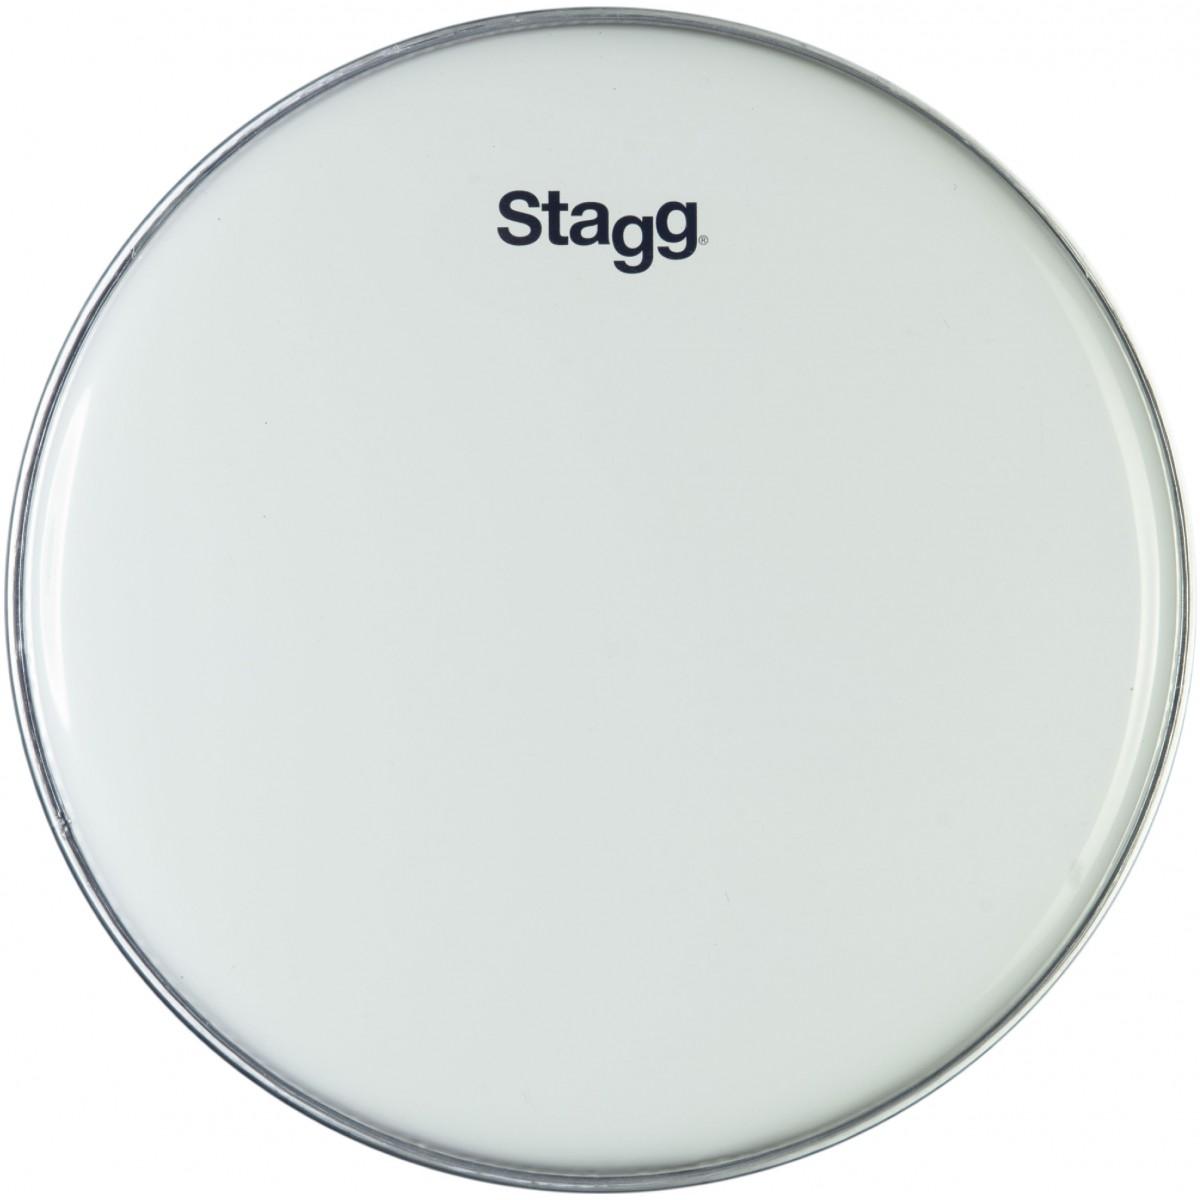 Stagg TAB-12 HEAD, 12